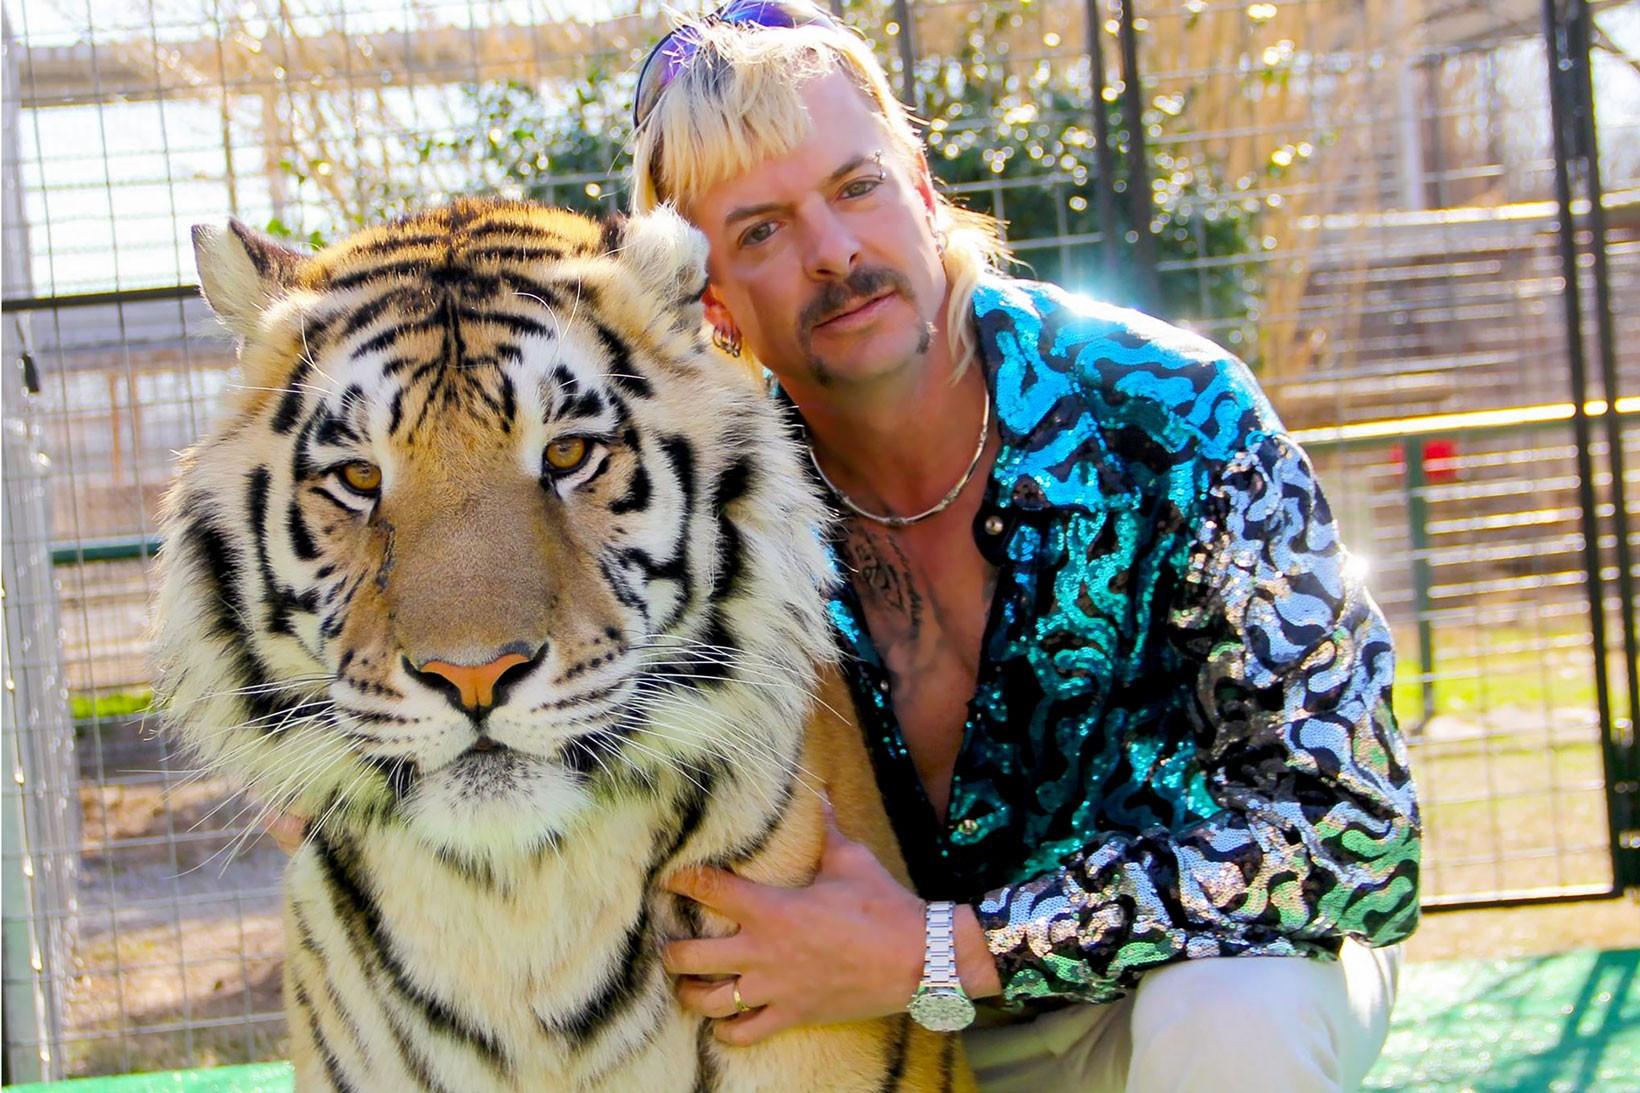 https___hypebeast.com_wp-content_blogs.dir_6_files_2020_03_netflix-tiger-king-joe-exotic-style...jpg